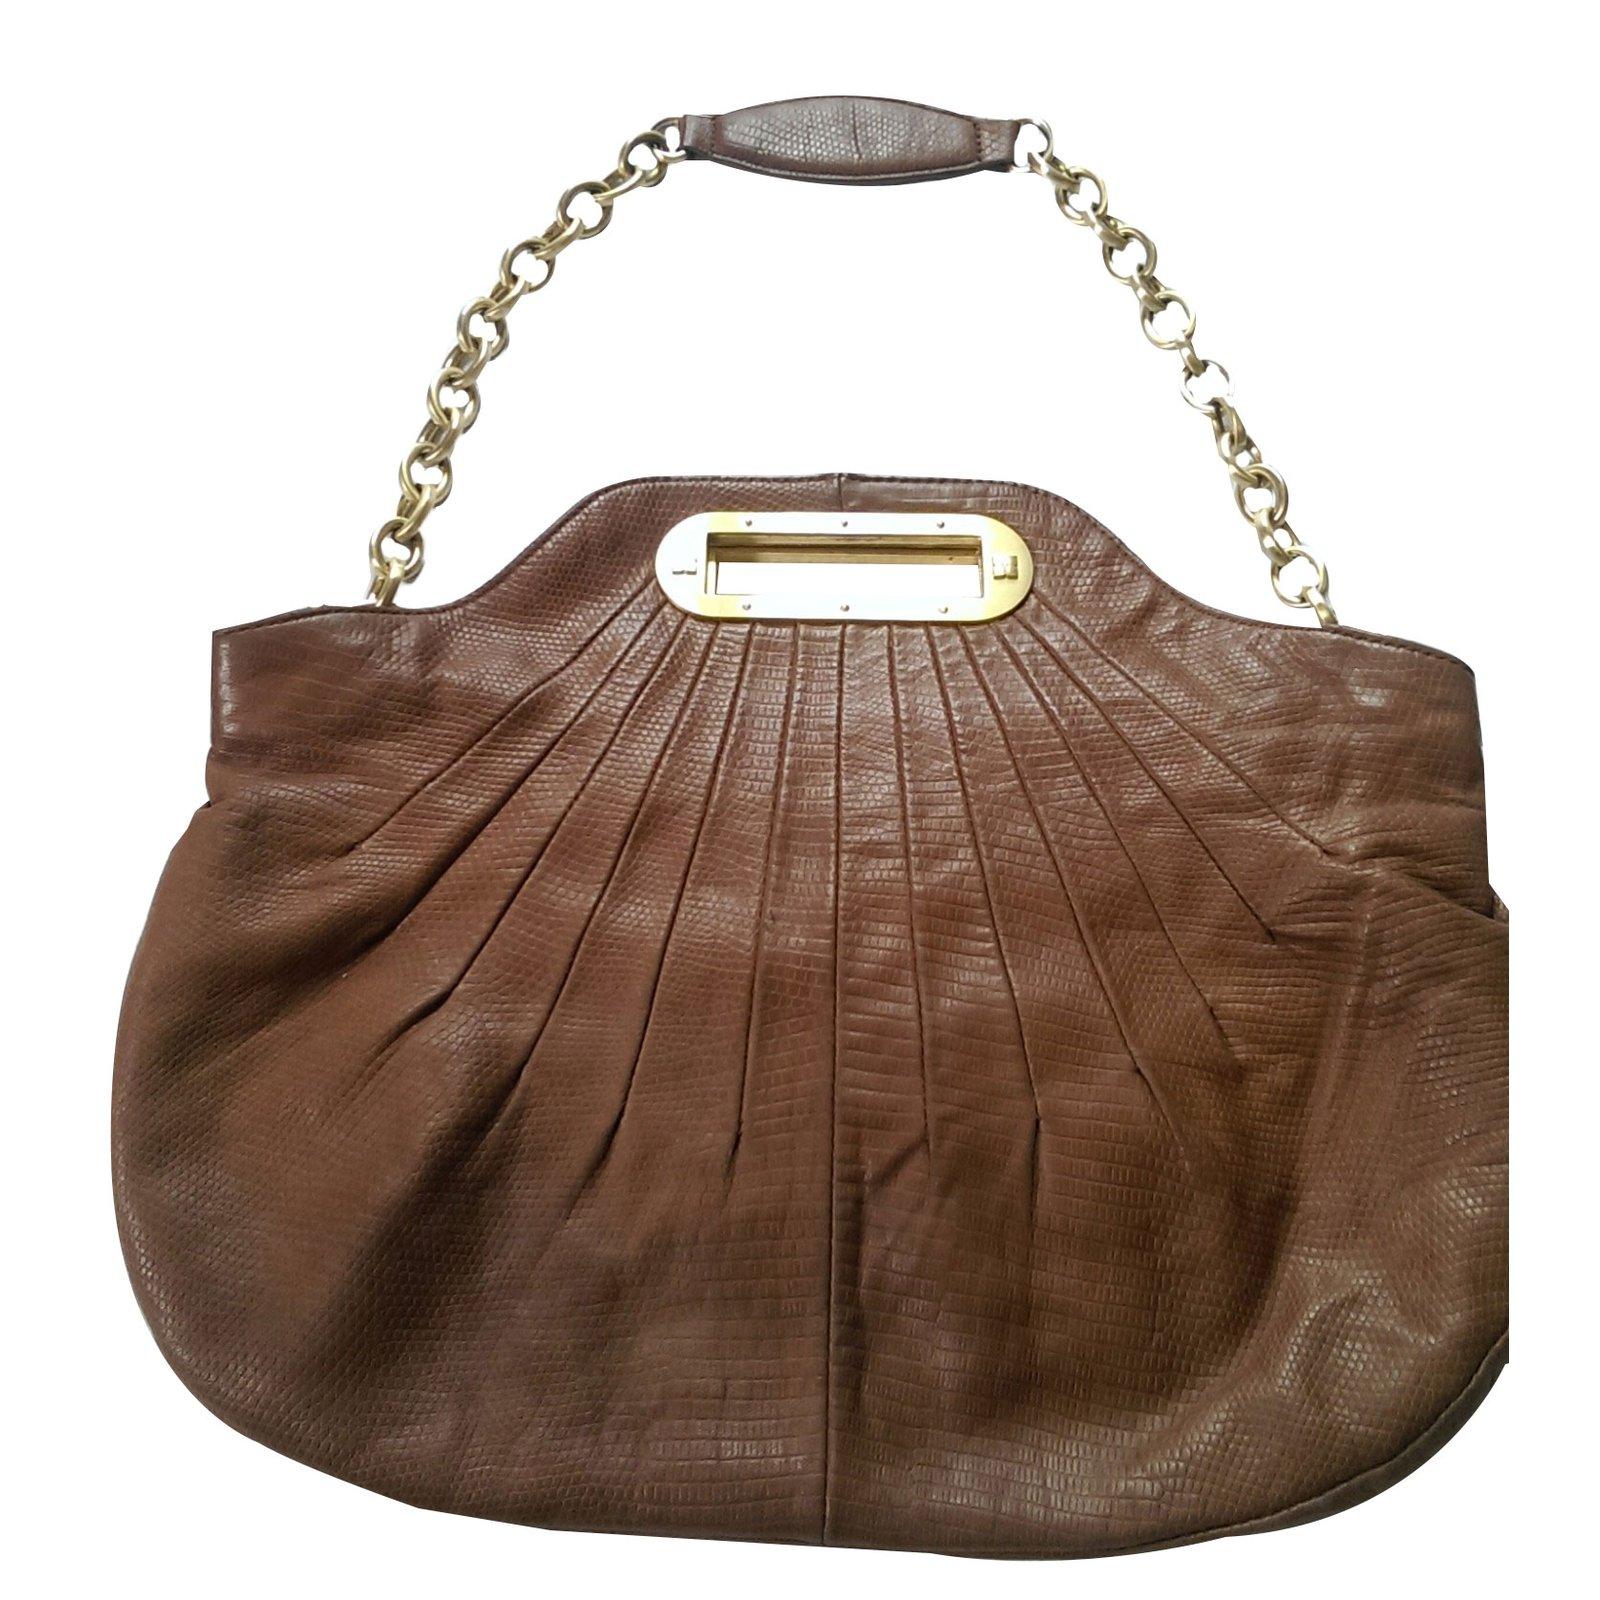 Bcbg Max Azria Handbag Handbags Leather Caramel Ref 41352